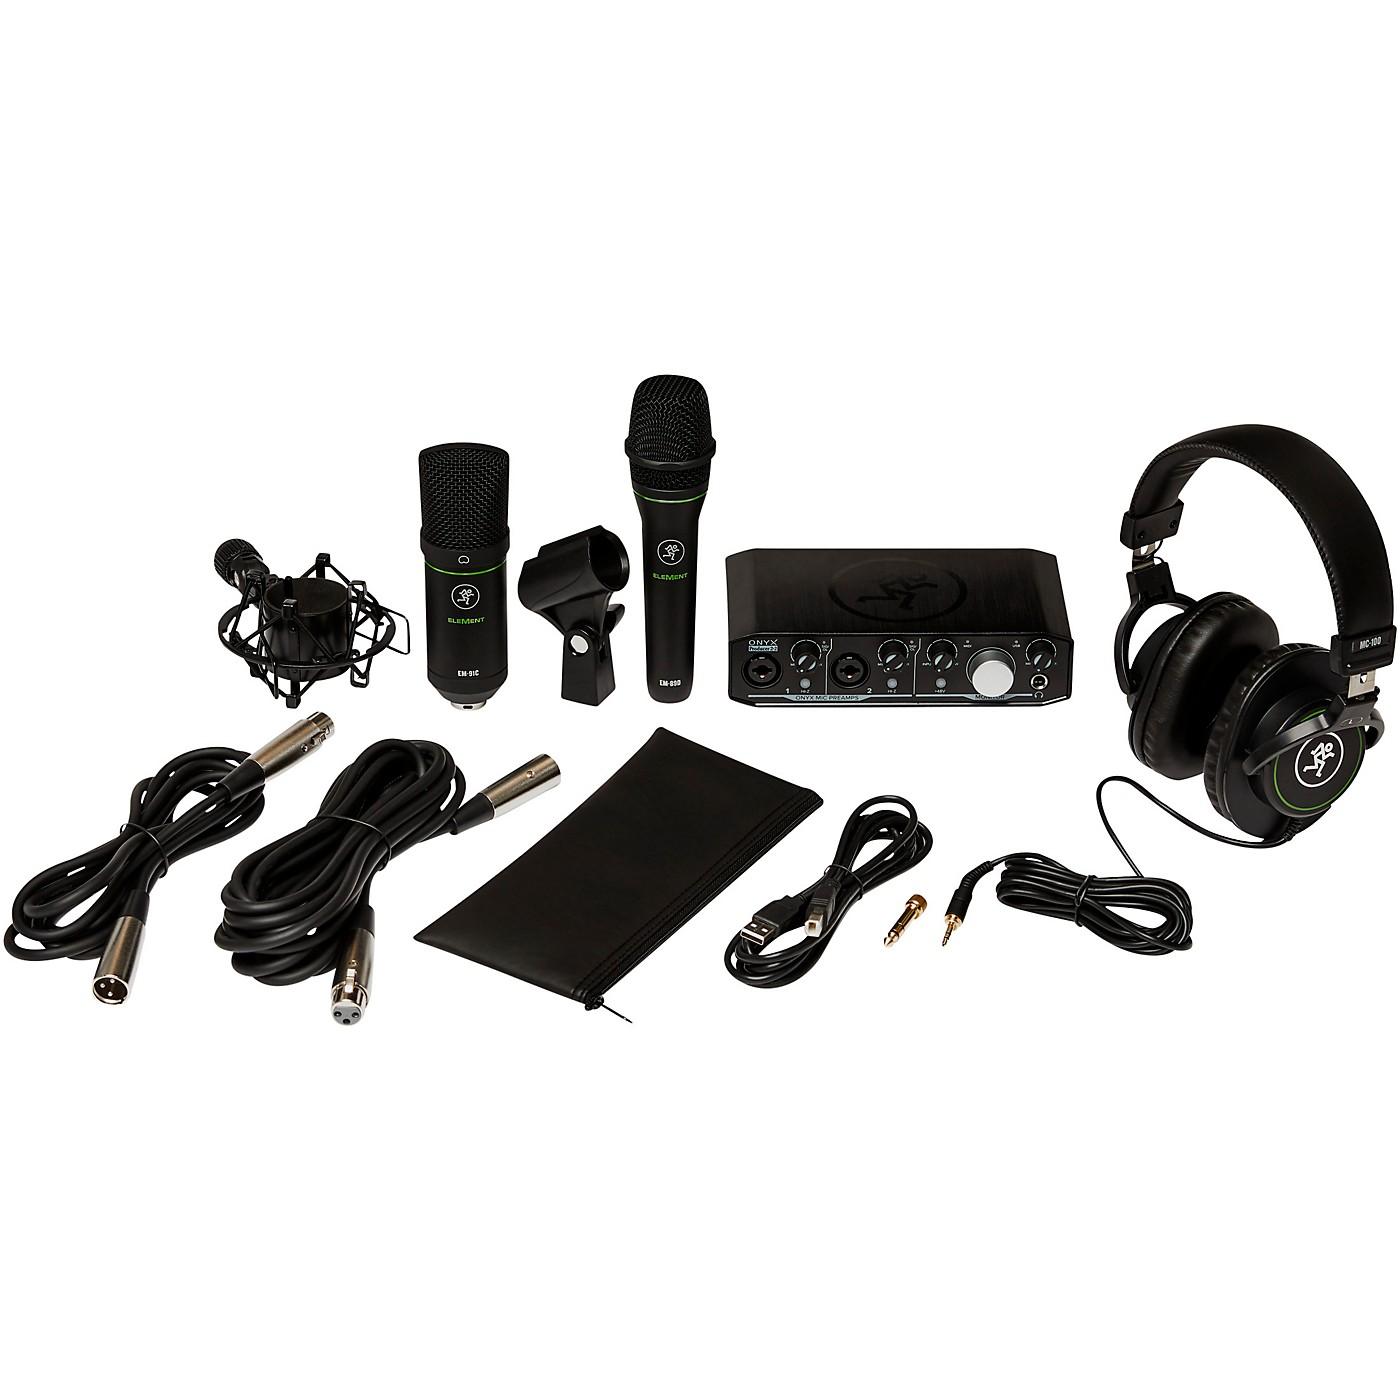 Mackie Recording Bundle with Onyx Producer Interface, EM89D Dynamic Mic, EM91C Condenser Mic and MC-100 Headphones thumbnail